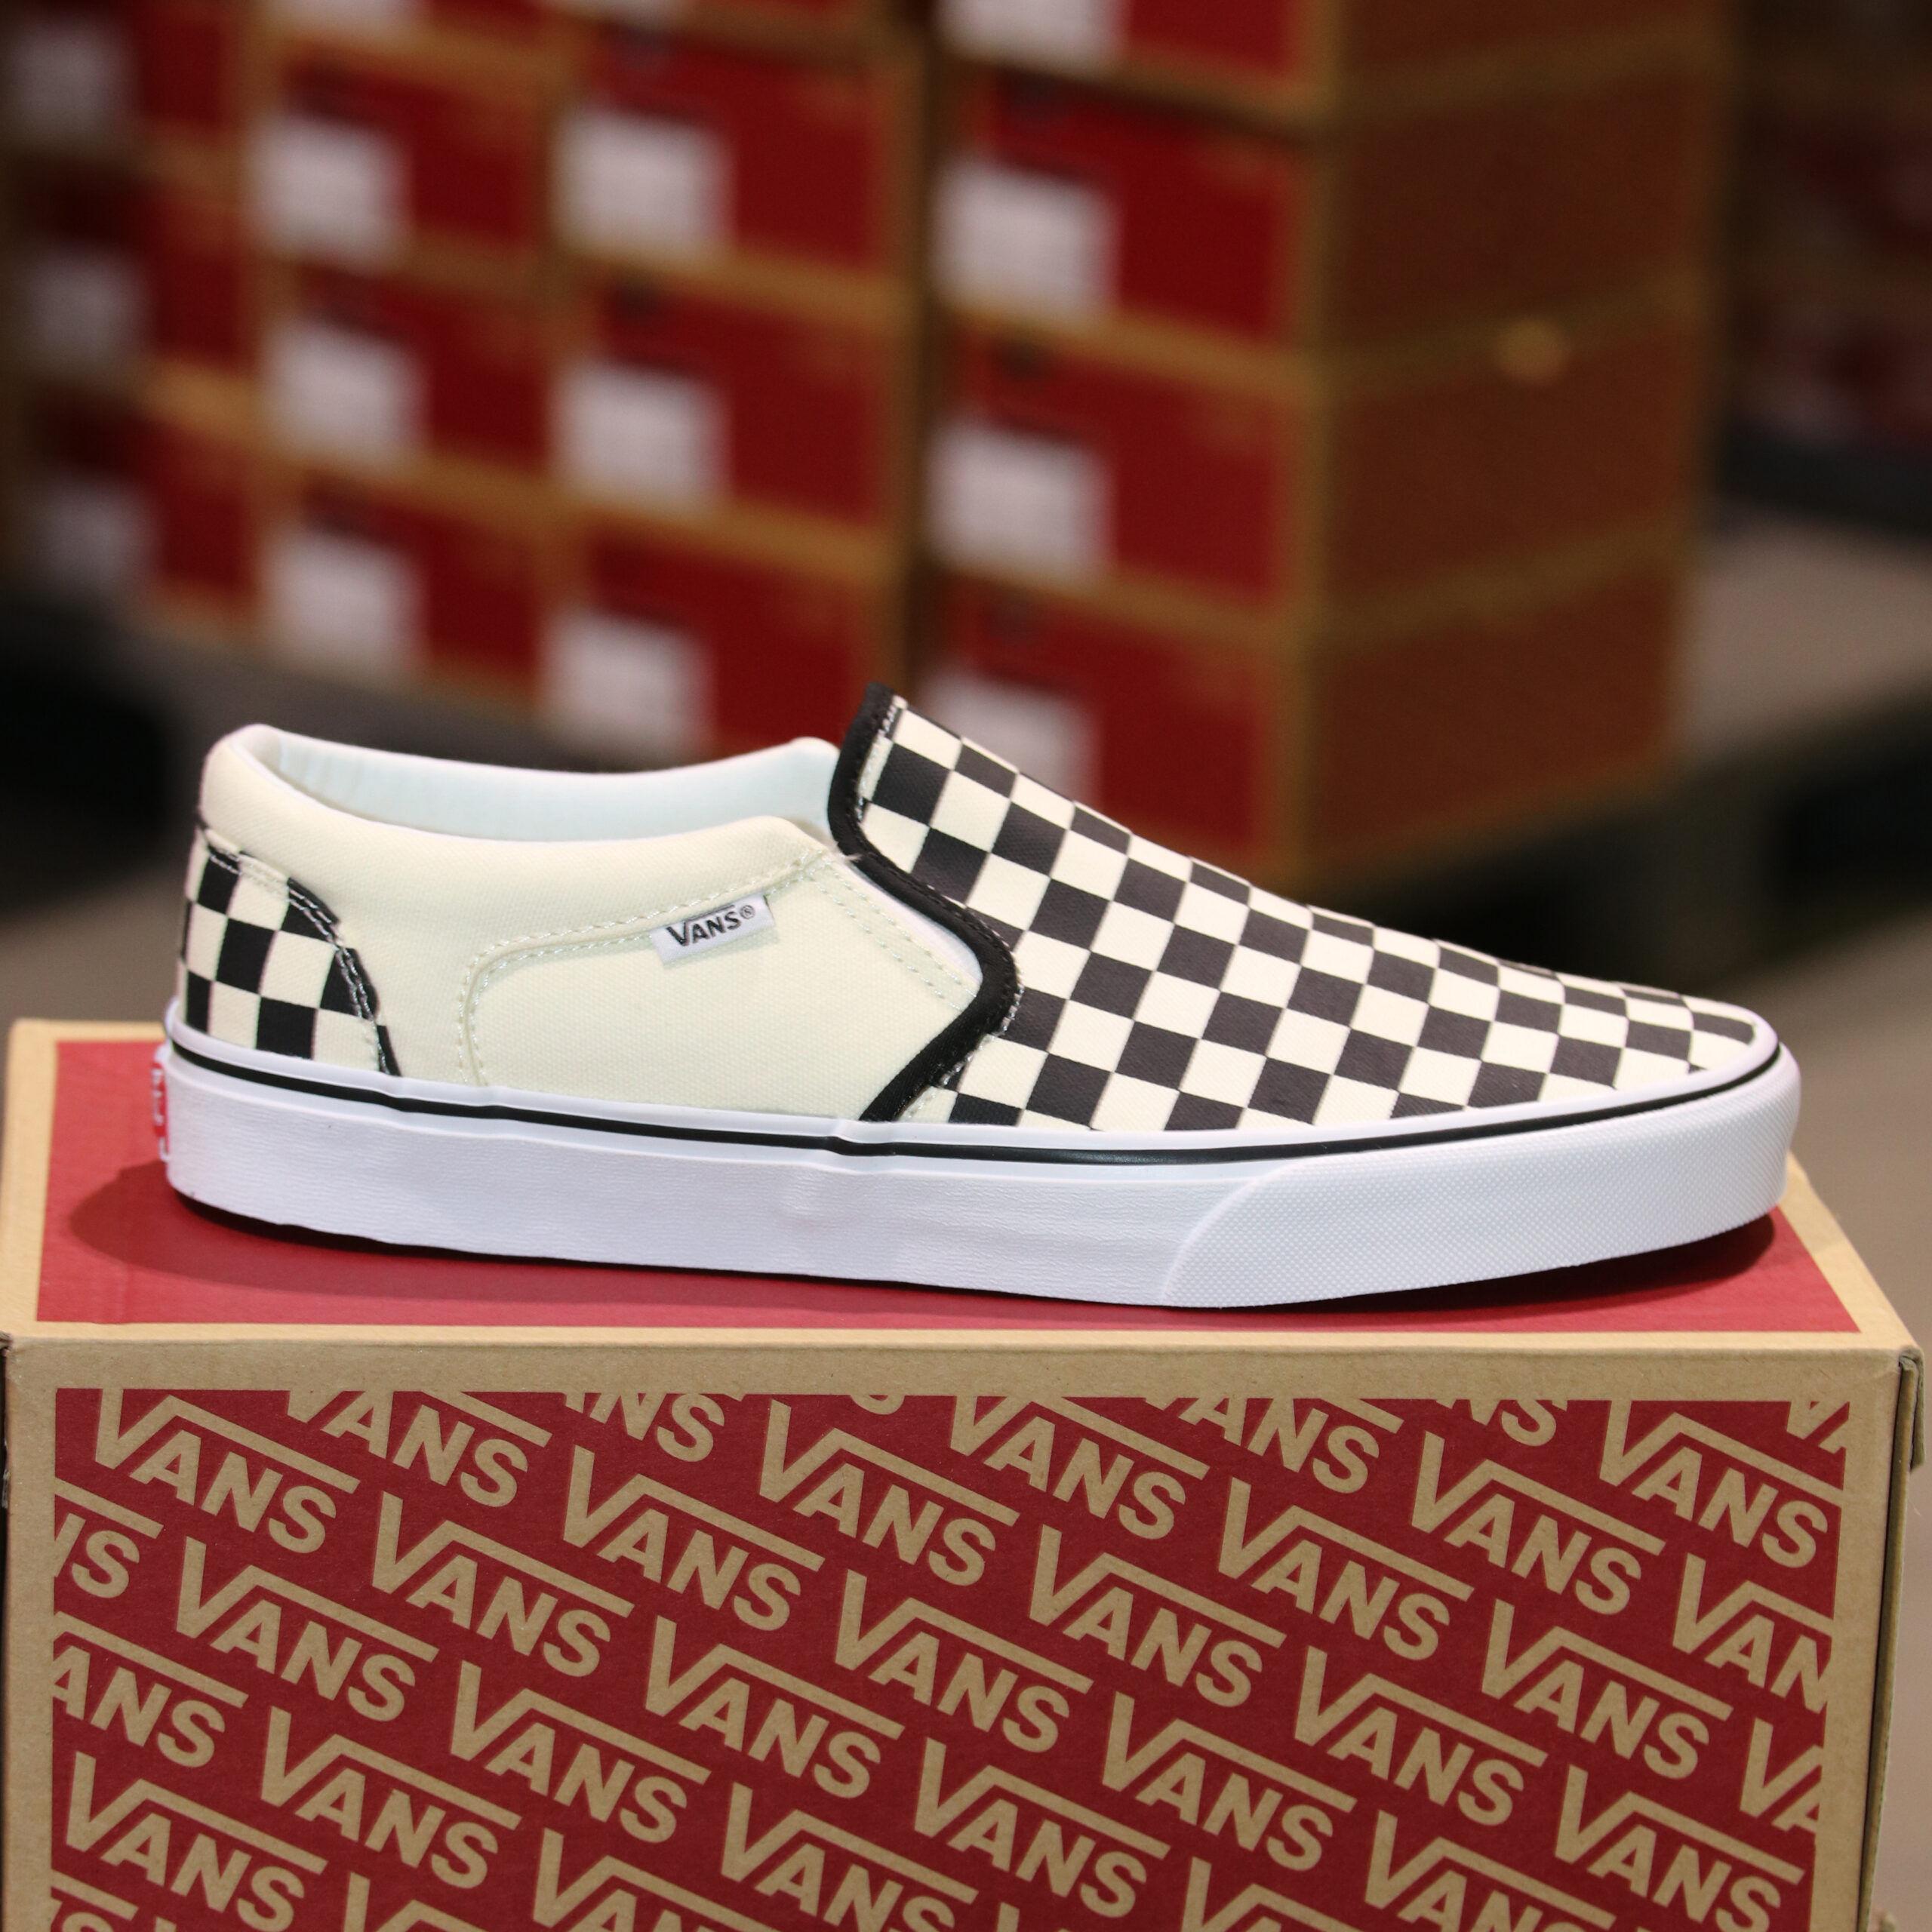 Merker VANS Vans - Asher (Checkers) Black/Natural 45